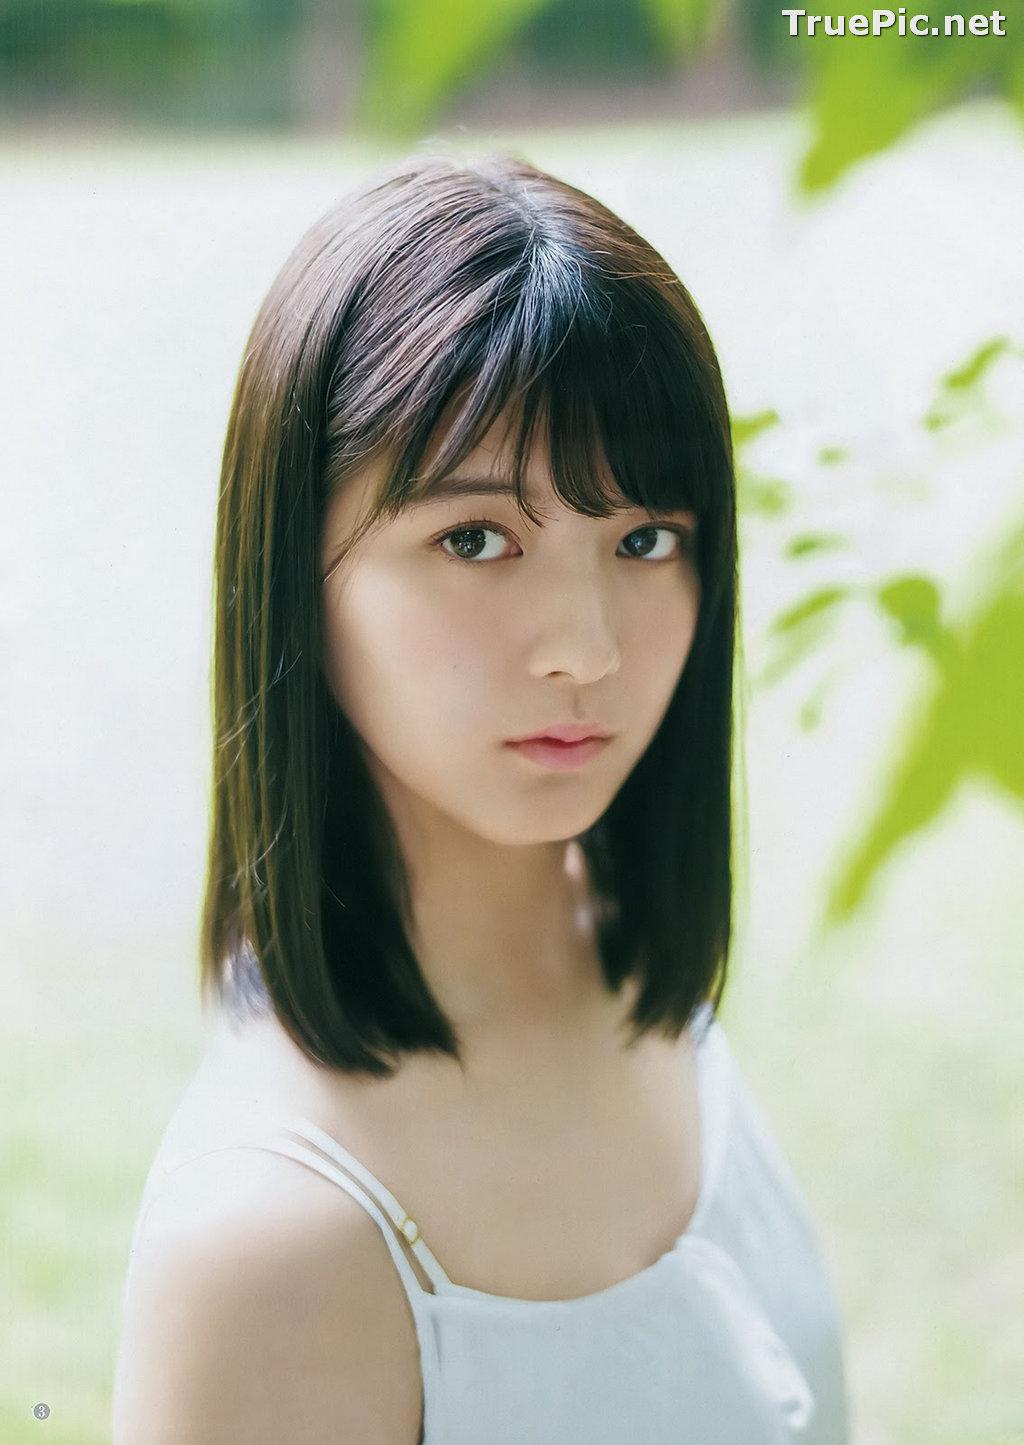 Image Japanese Idol Singer - Yumiko Seki (関有美子) - Beautiful Picture Collection 2020 - TruePic.net - Picture-9